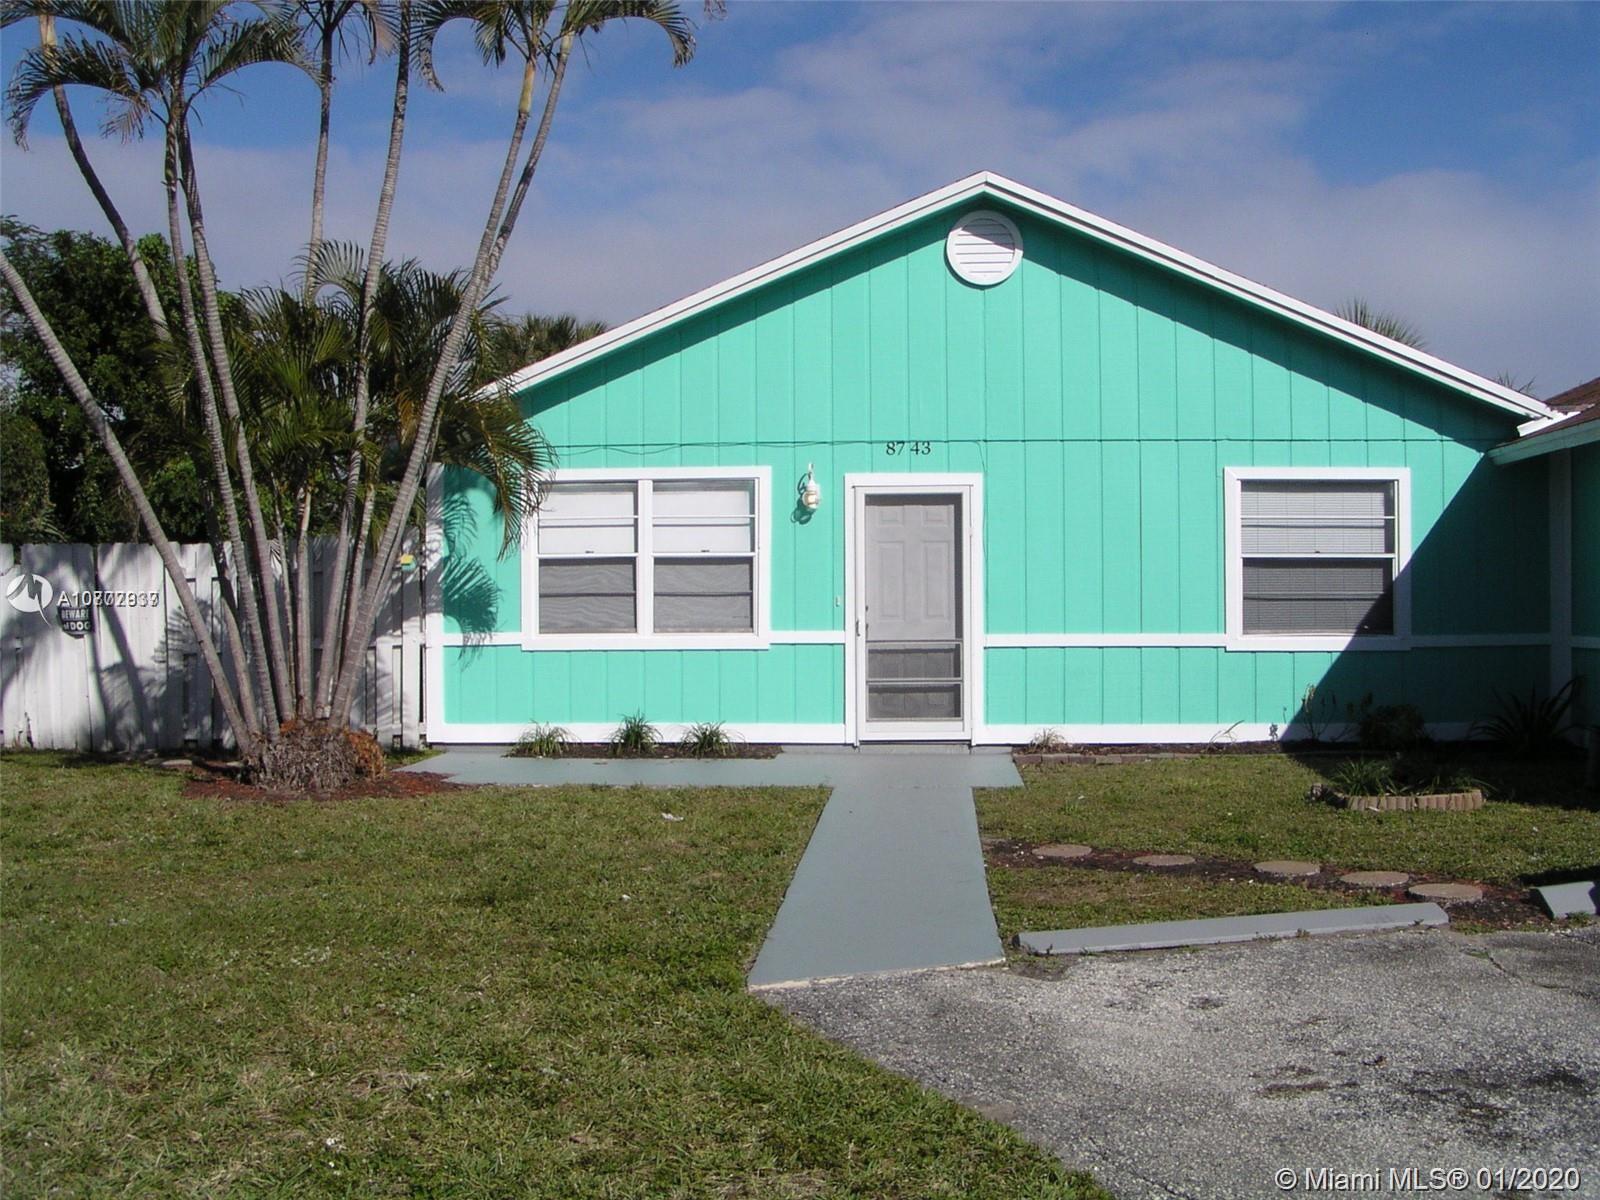 8743 Sol Ter 0, West Palm Beach, FL 33403